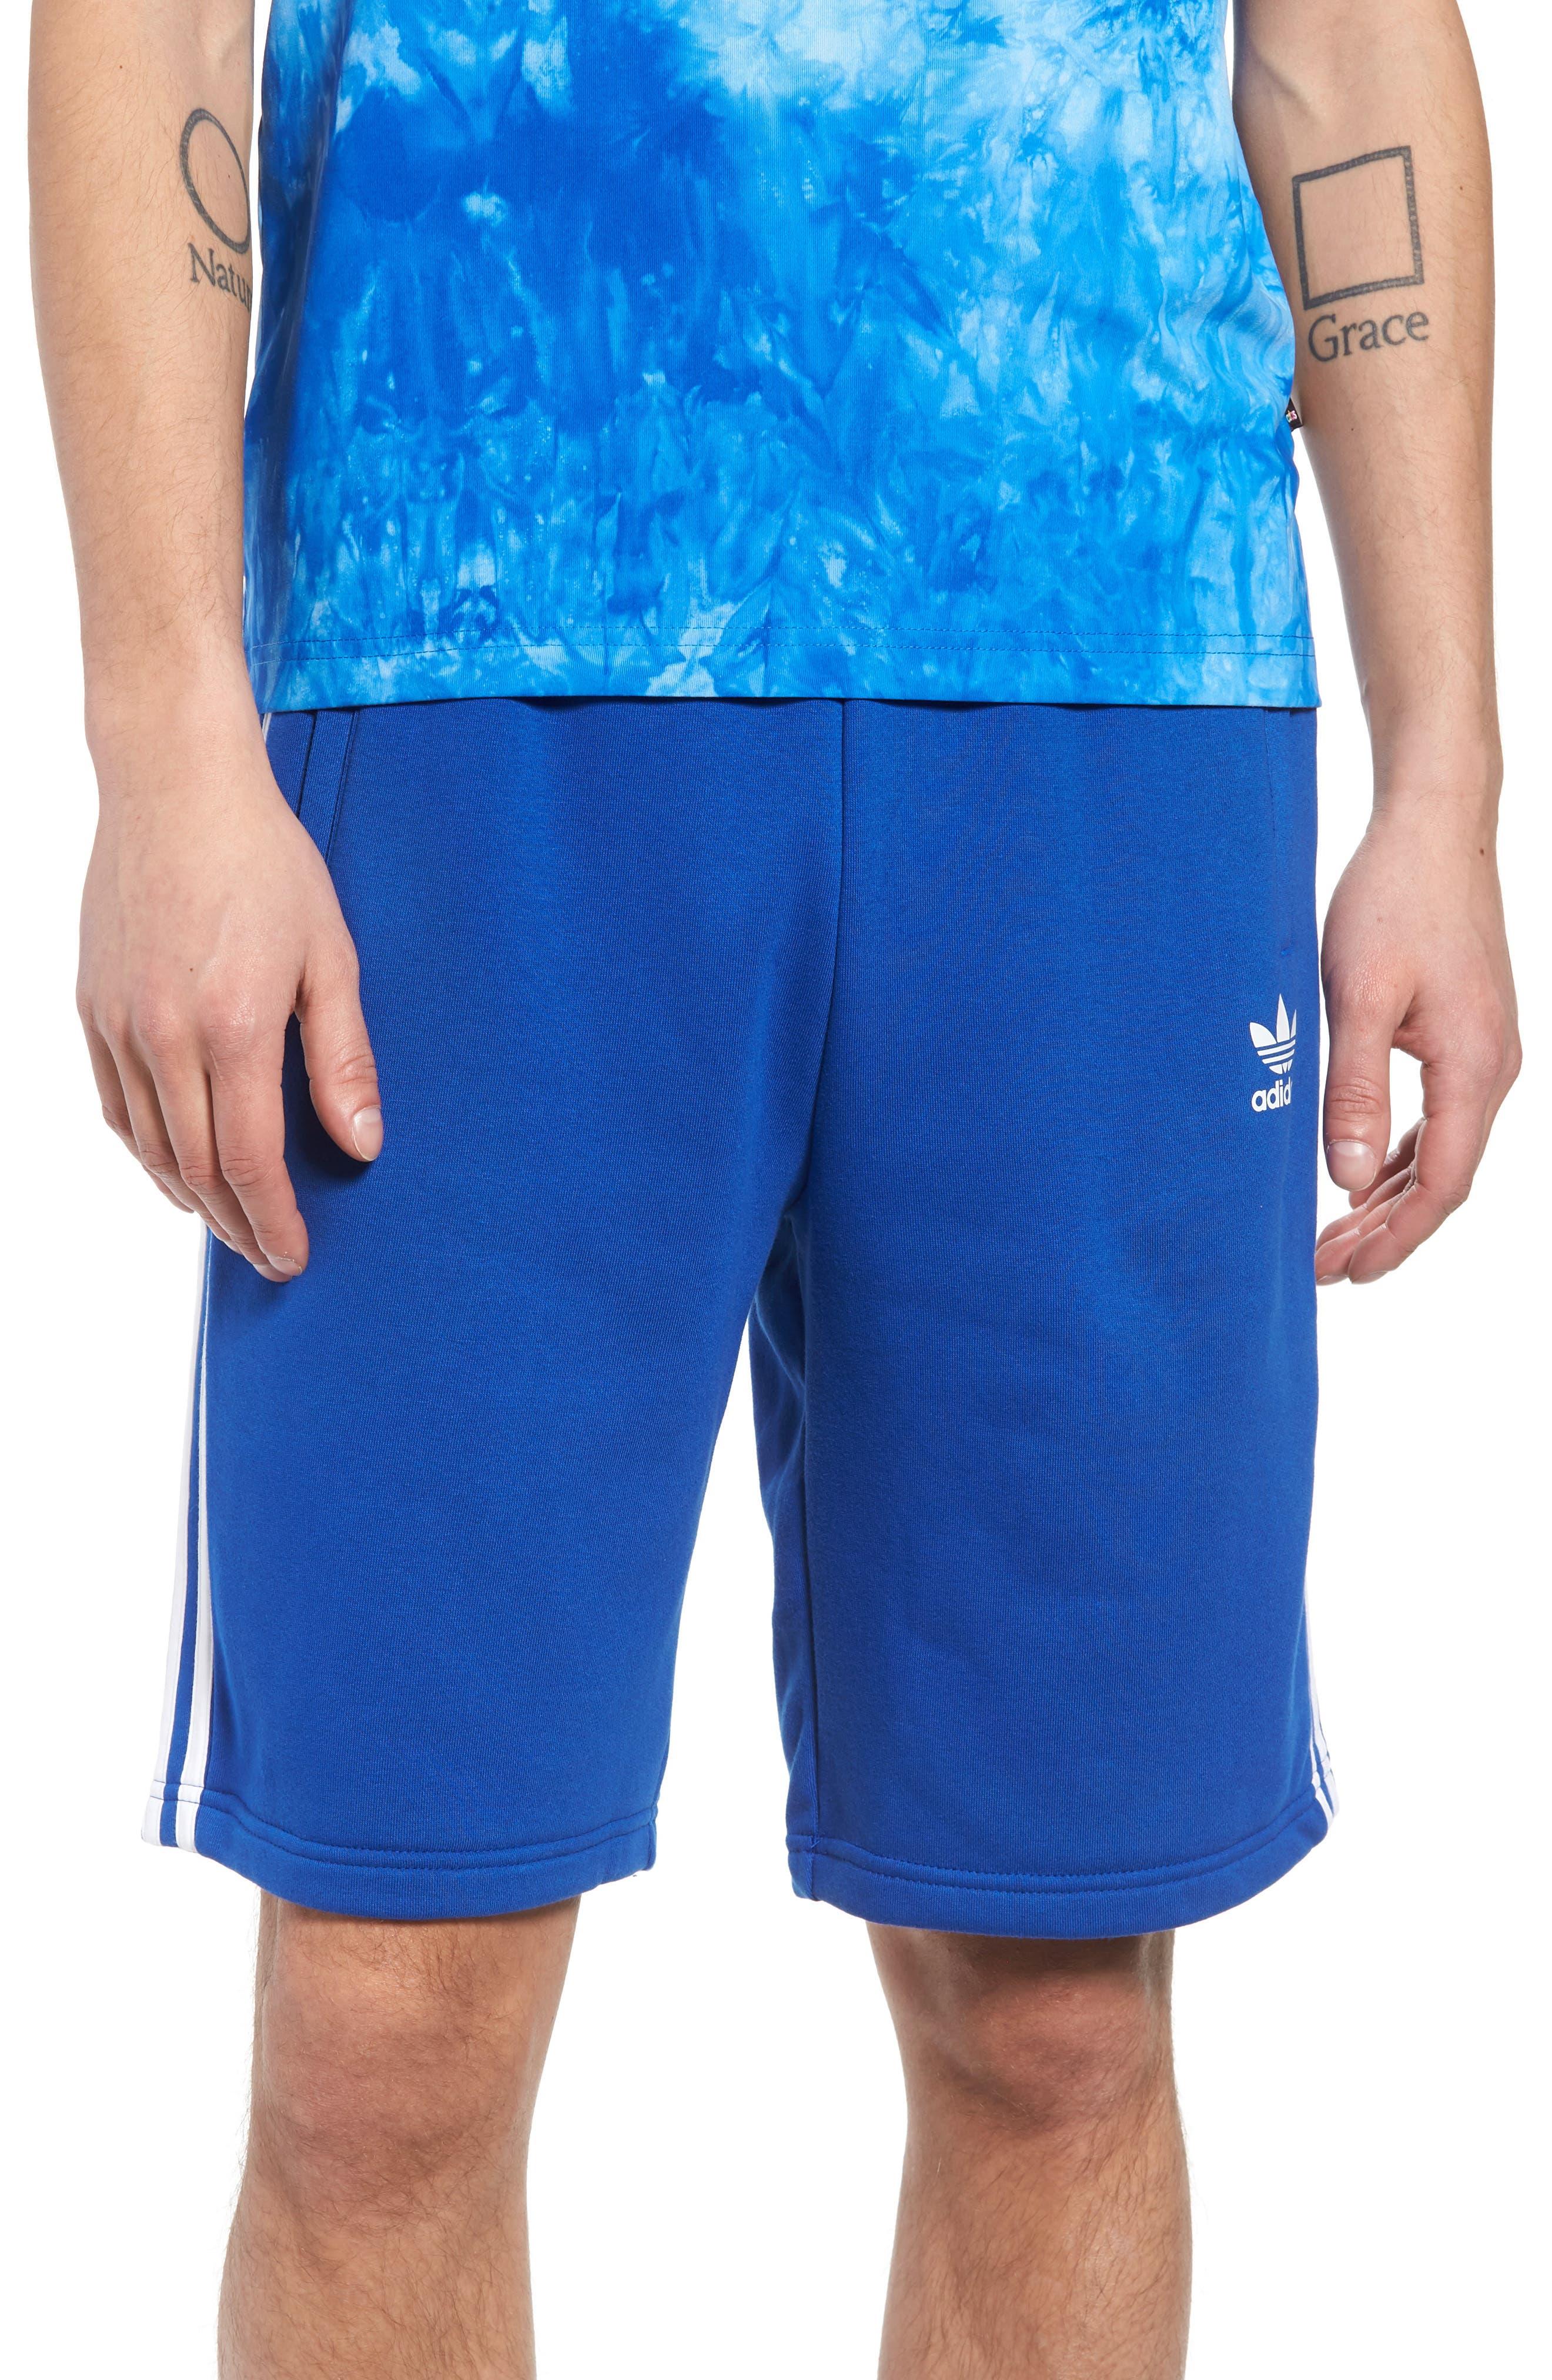 Alternate Image 1 Selected - adidas Originals 3-Stripes Shorts